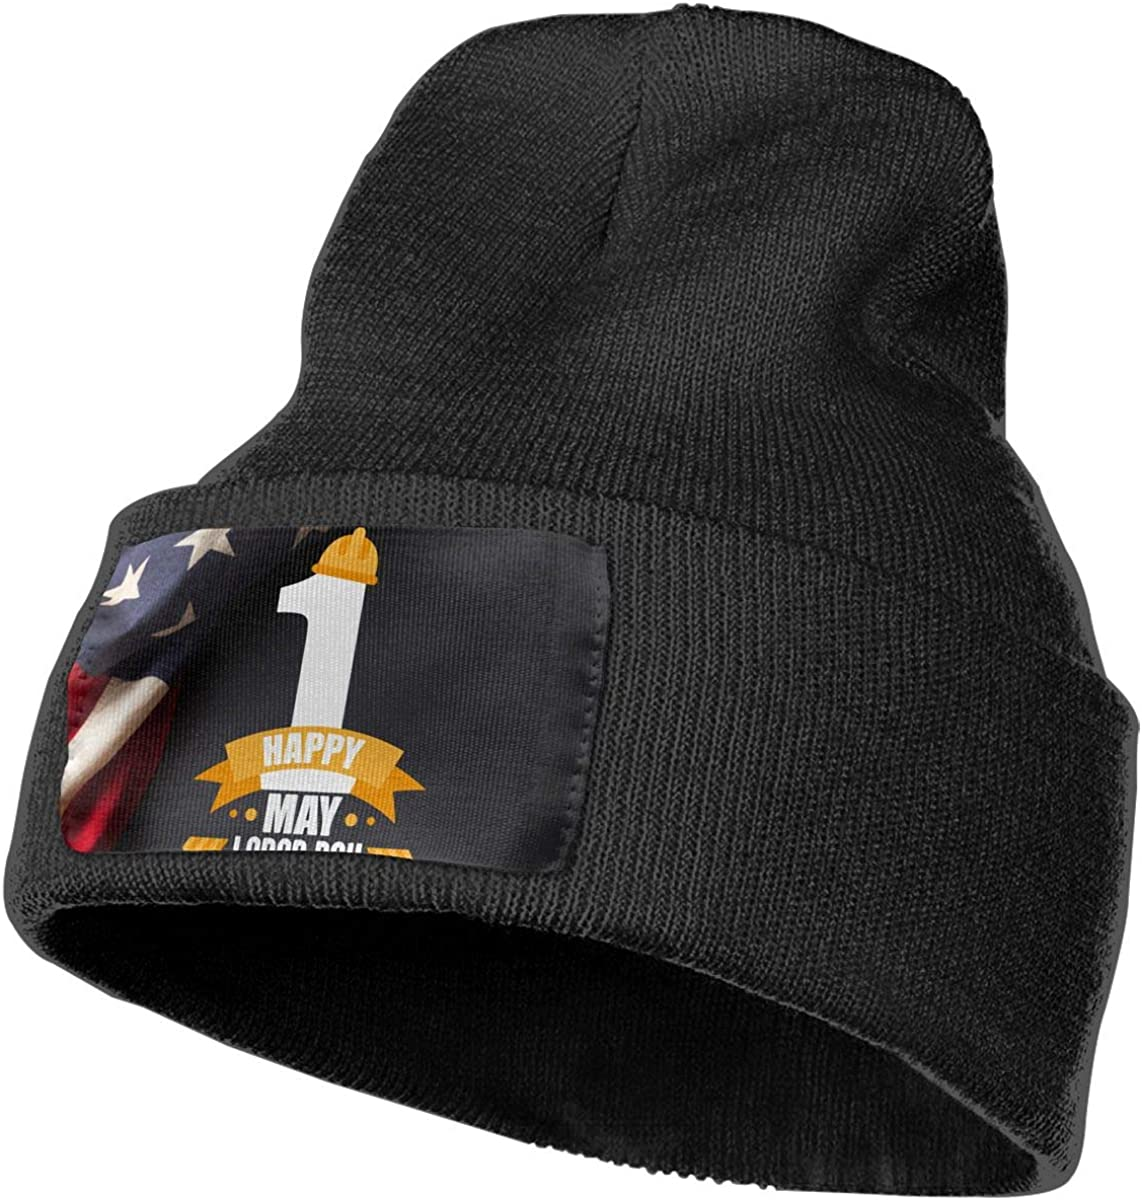 Happy Labor Day American Flag Skull Cap Men /& Women Knitting Hats Stretchy /& Soft Beanie